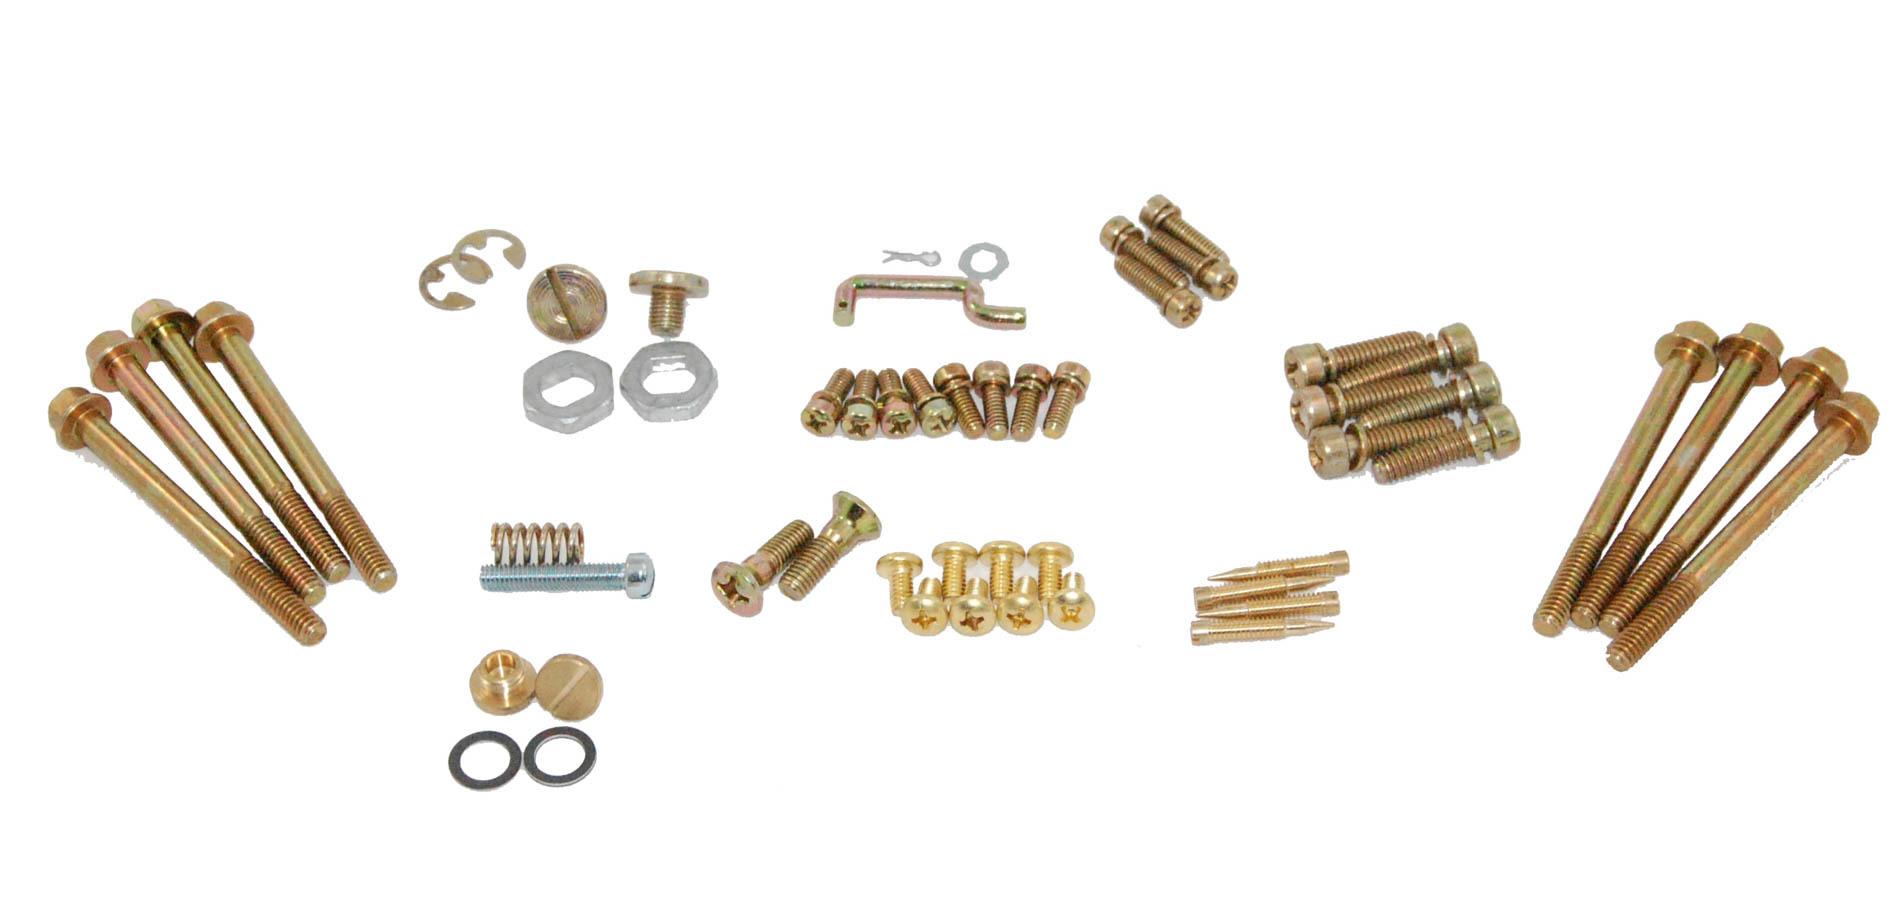 Advanced Engine Design Hardware Kit 4150 Double Pumper Carb